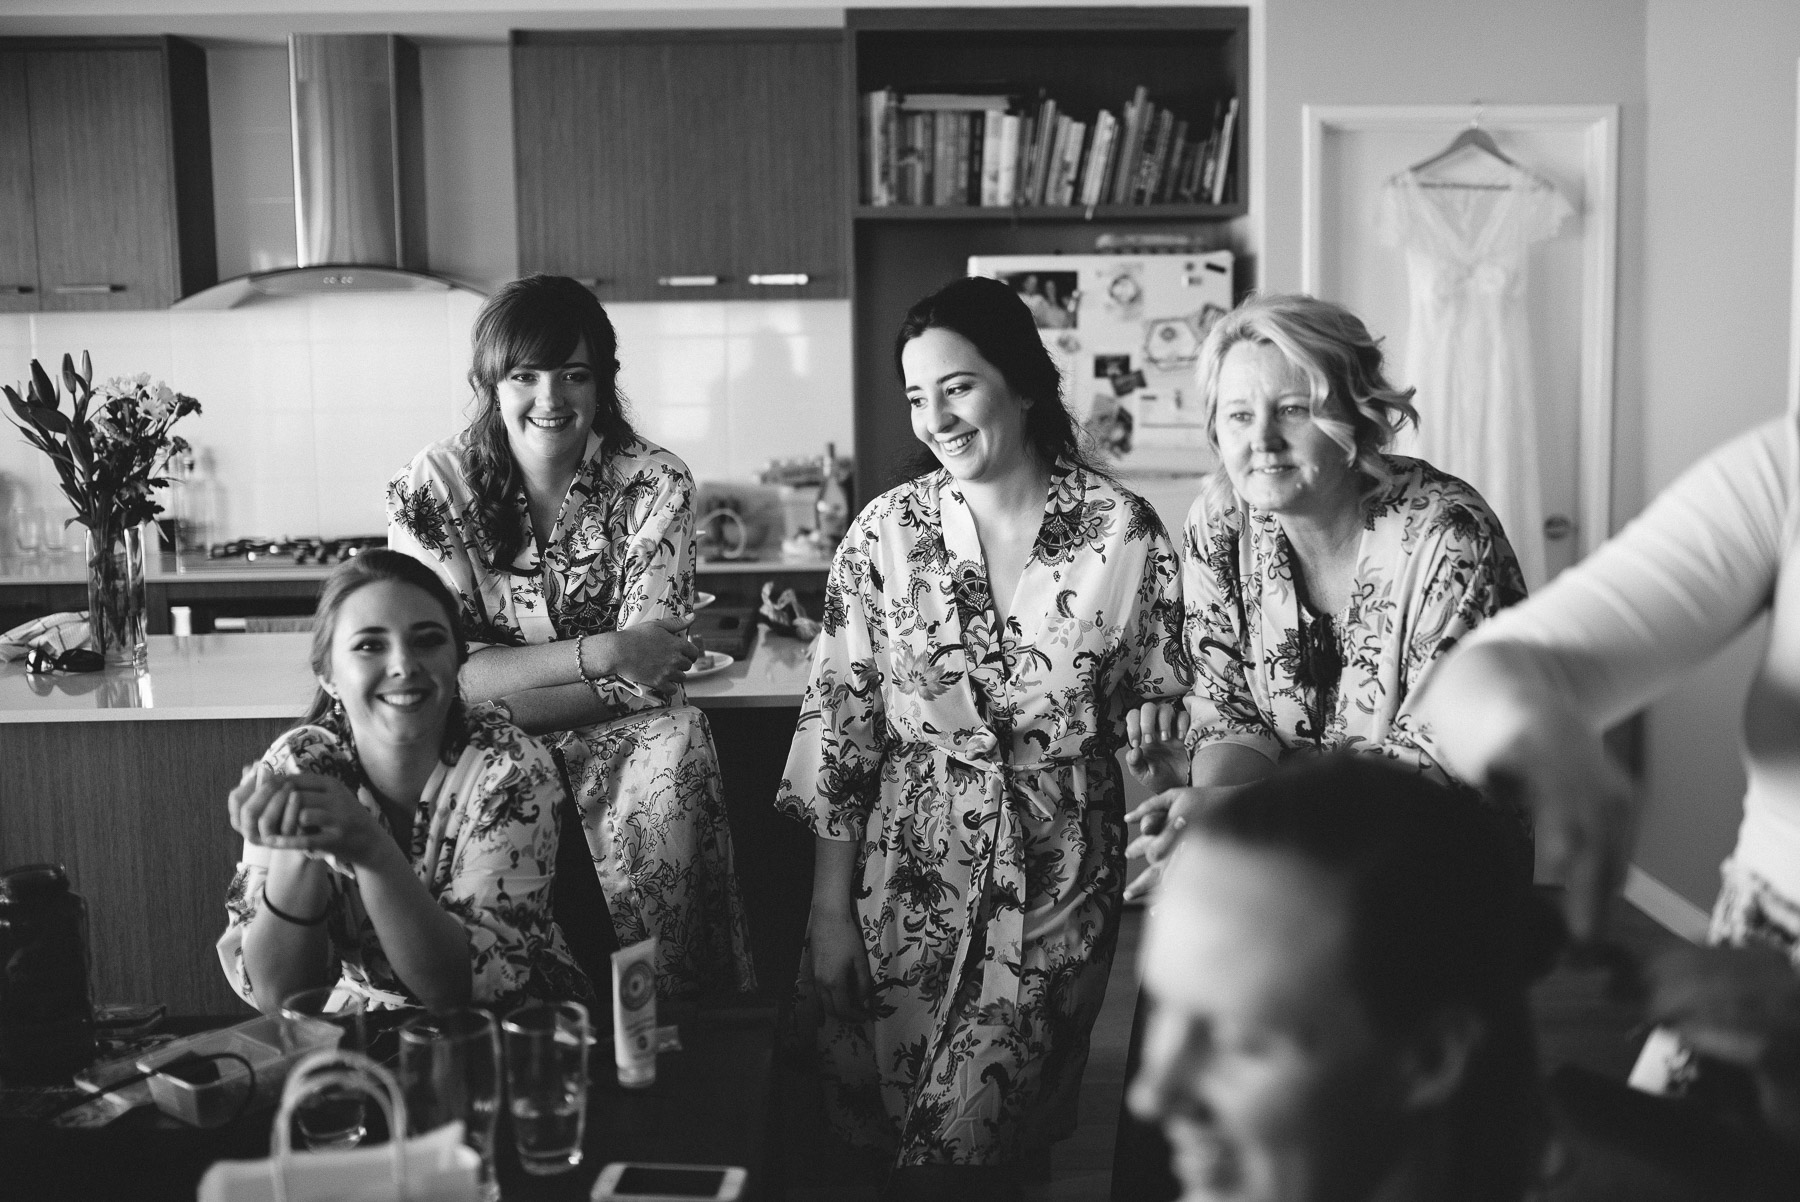 6-perth wedding bridesmaid robe.jpg